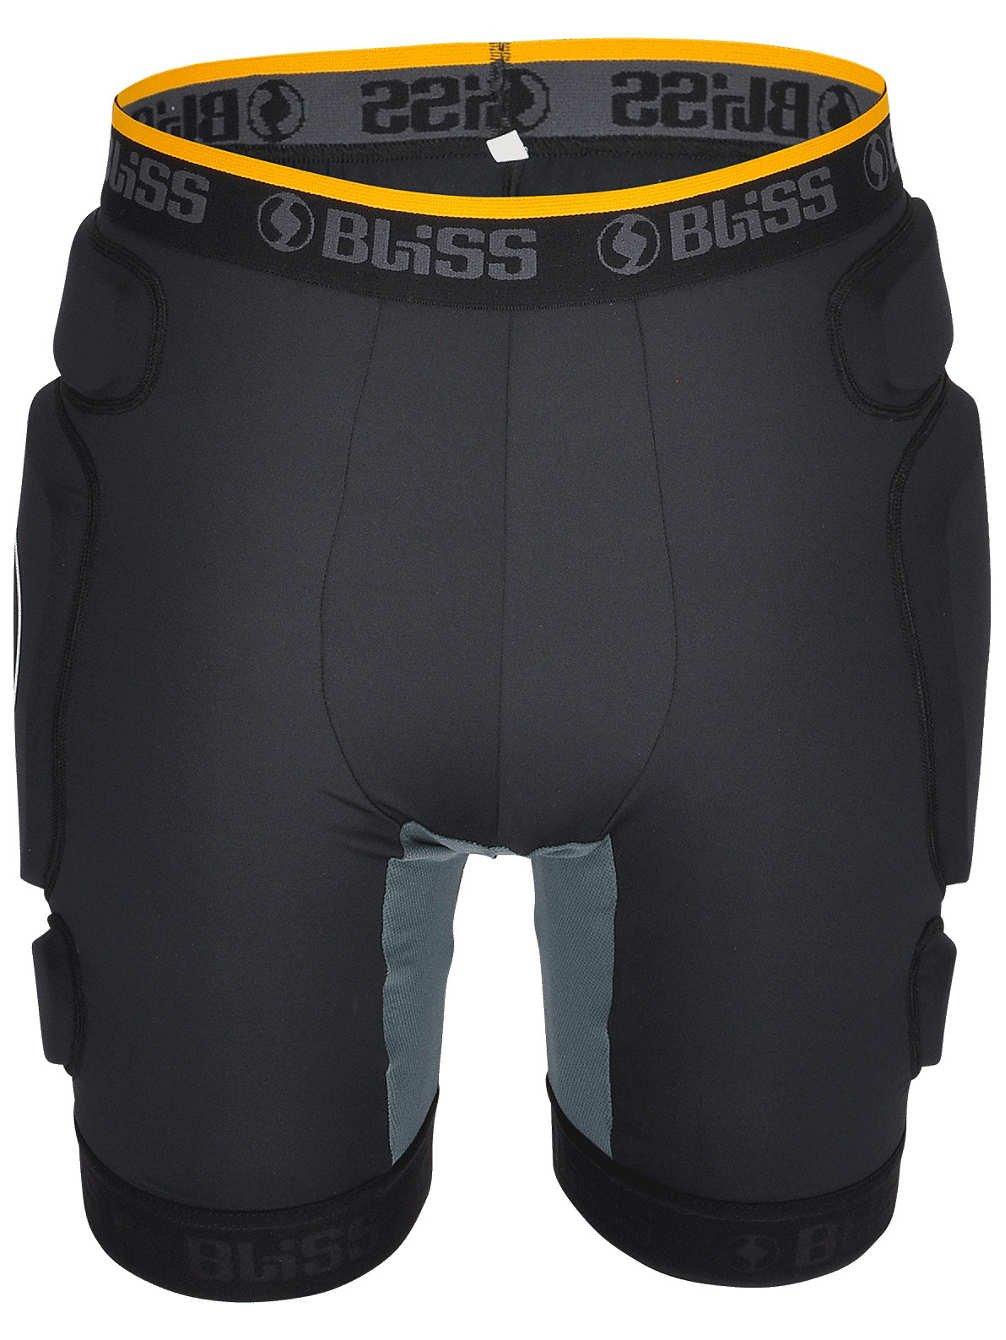 Bliss Herren Protektor Hose Team Shorts Protektorhose